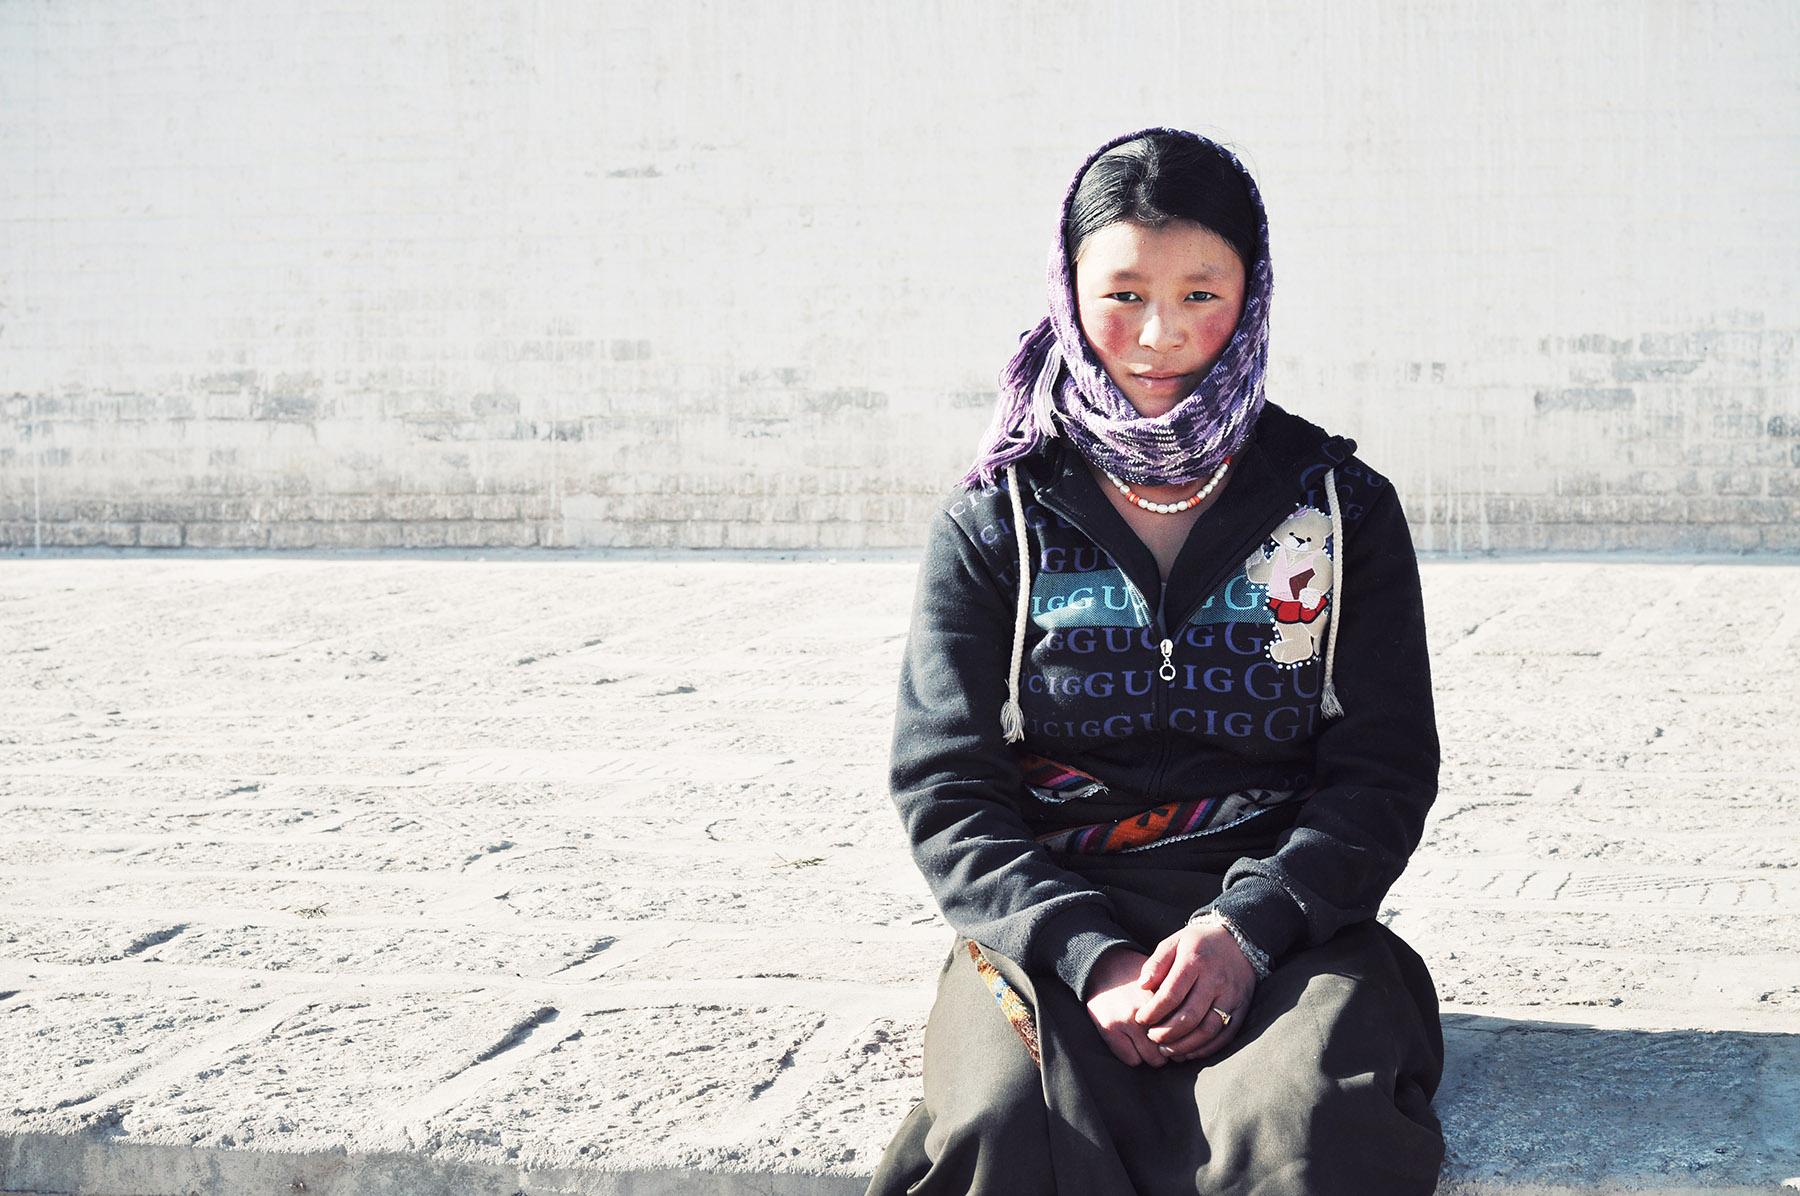 amdo-girl-rebkong-tibet.jpg